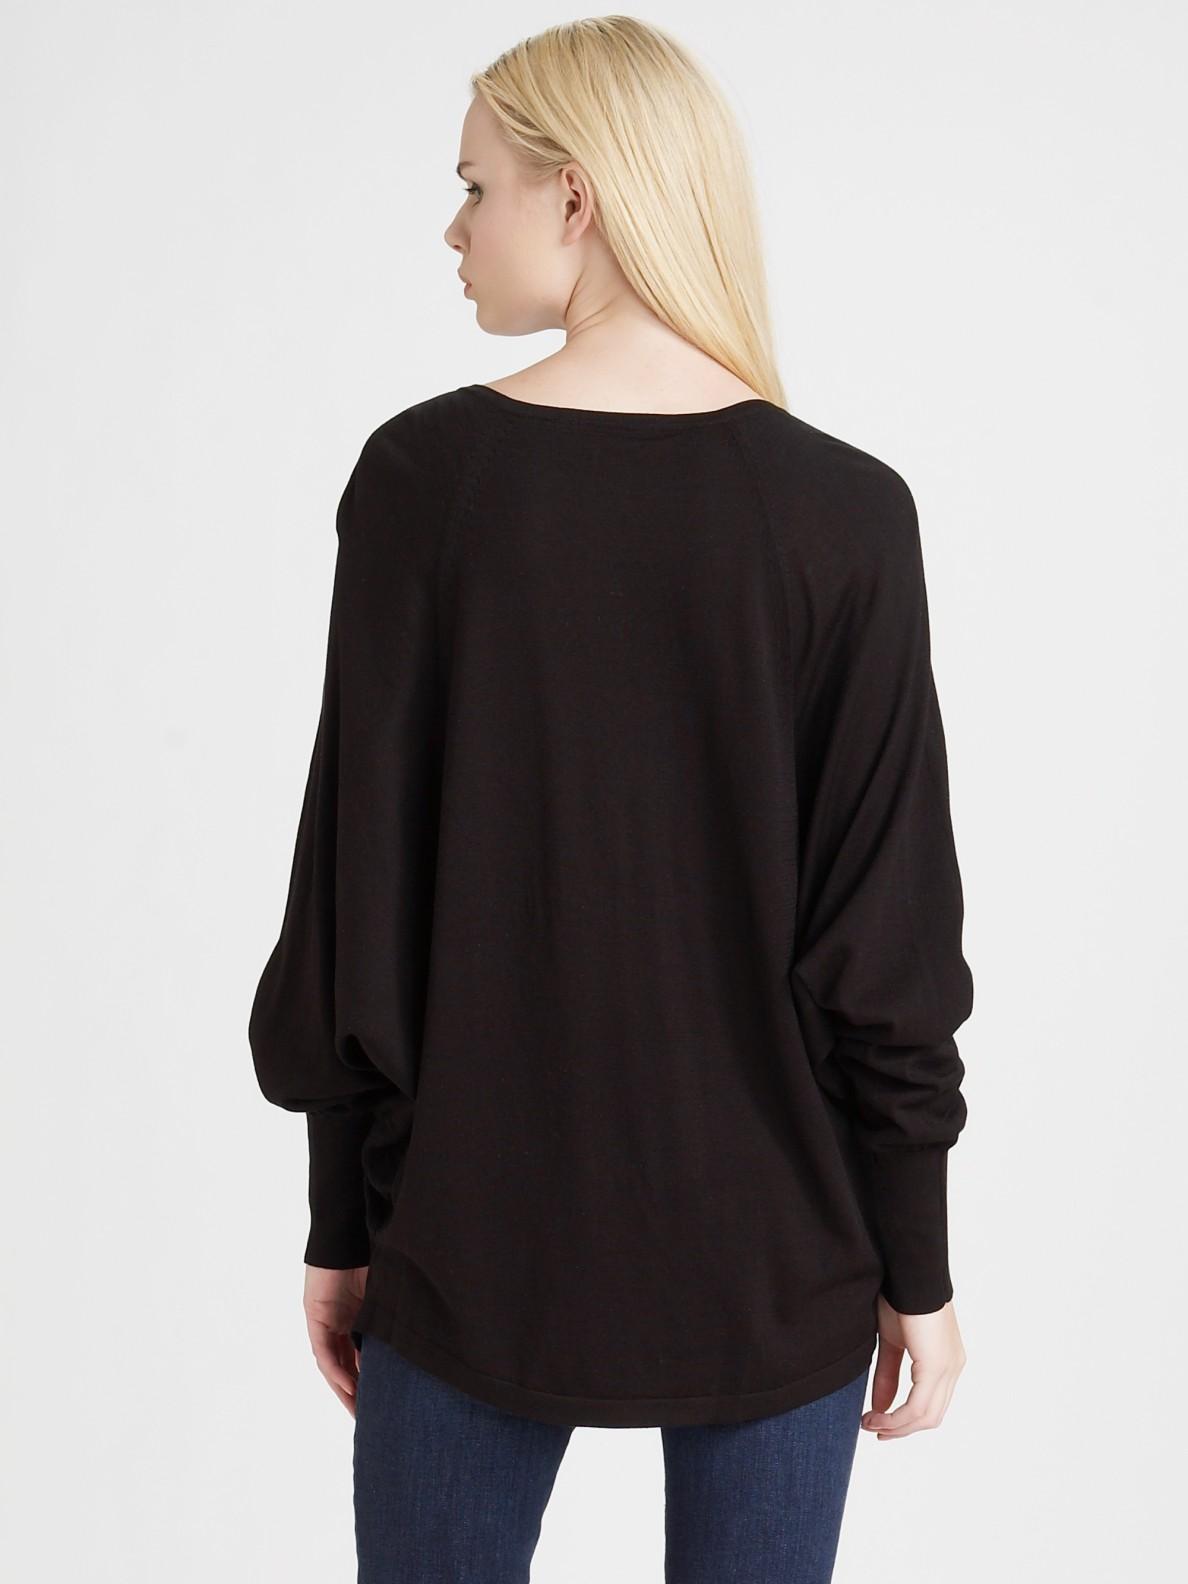 Bcbgmaxazria Boyfriend Sweater in Black | Lyst